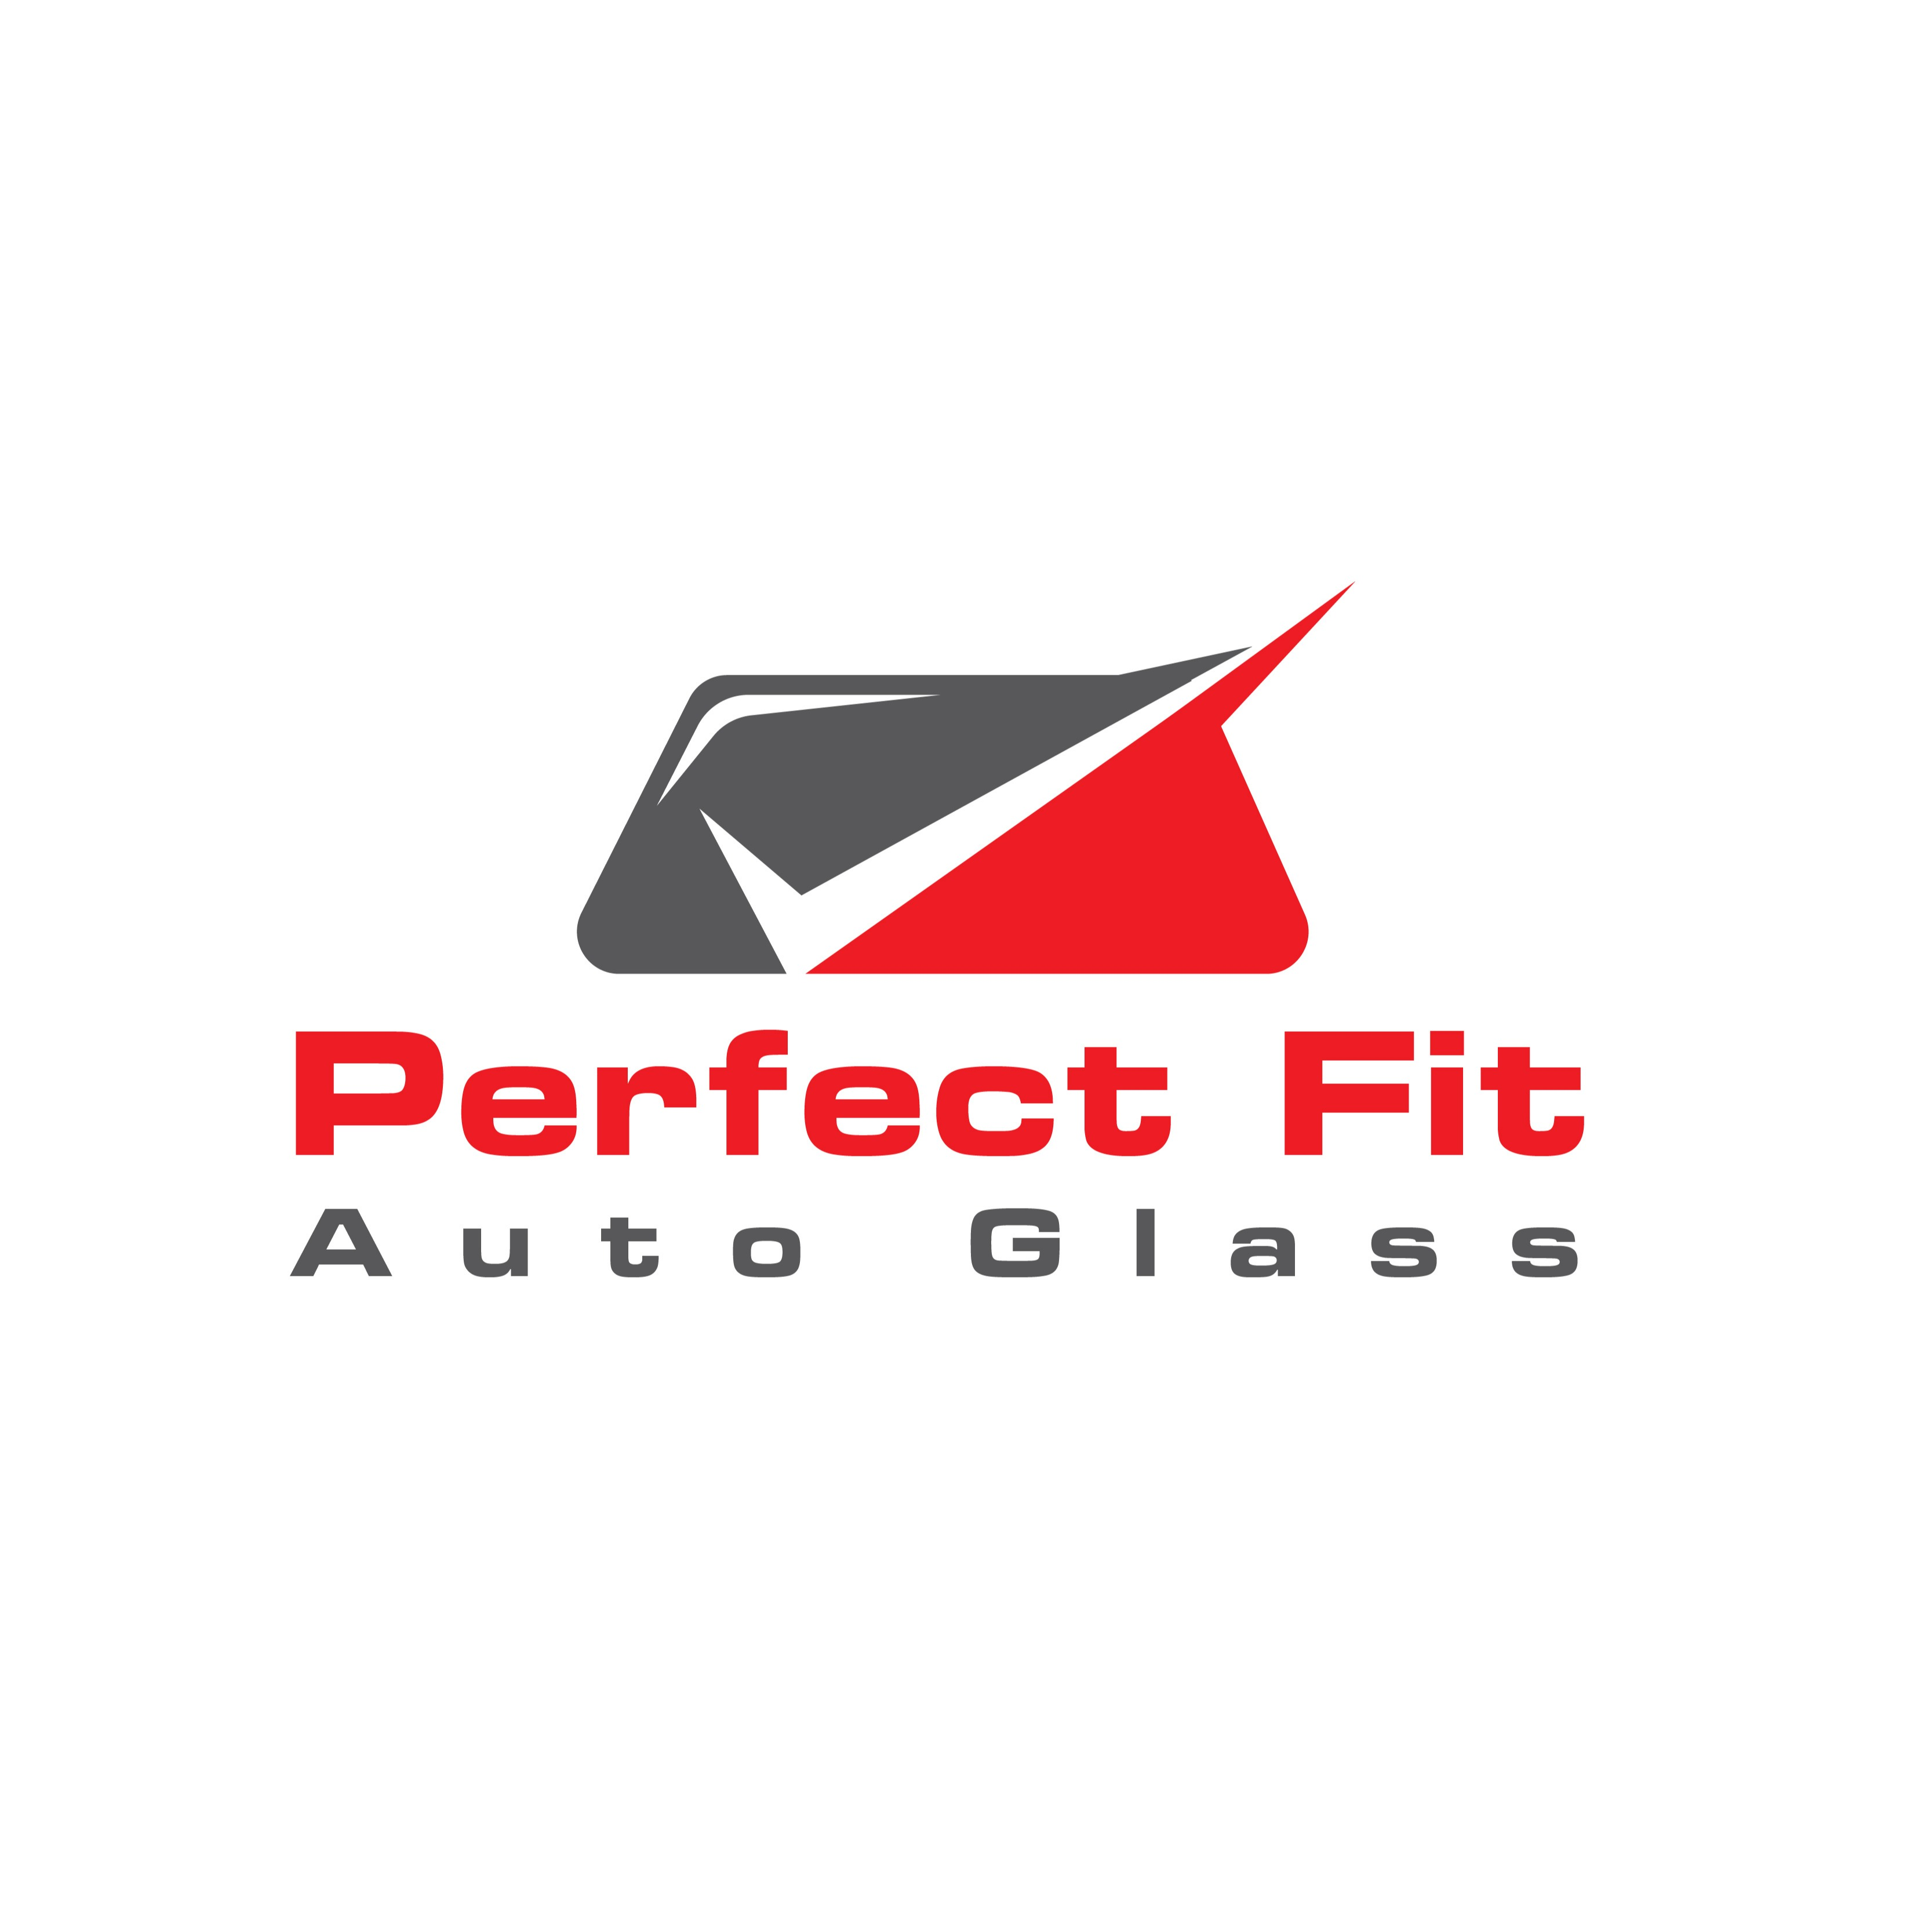 Perfect Fit Auto Glass - Clermont, FL 34711 - (407)753-5411 | ShowMeLocal.com